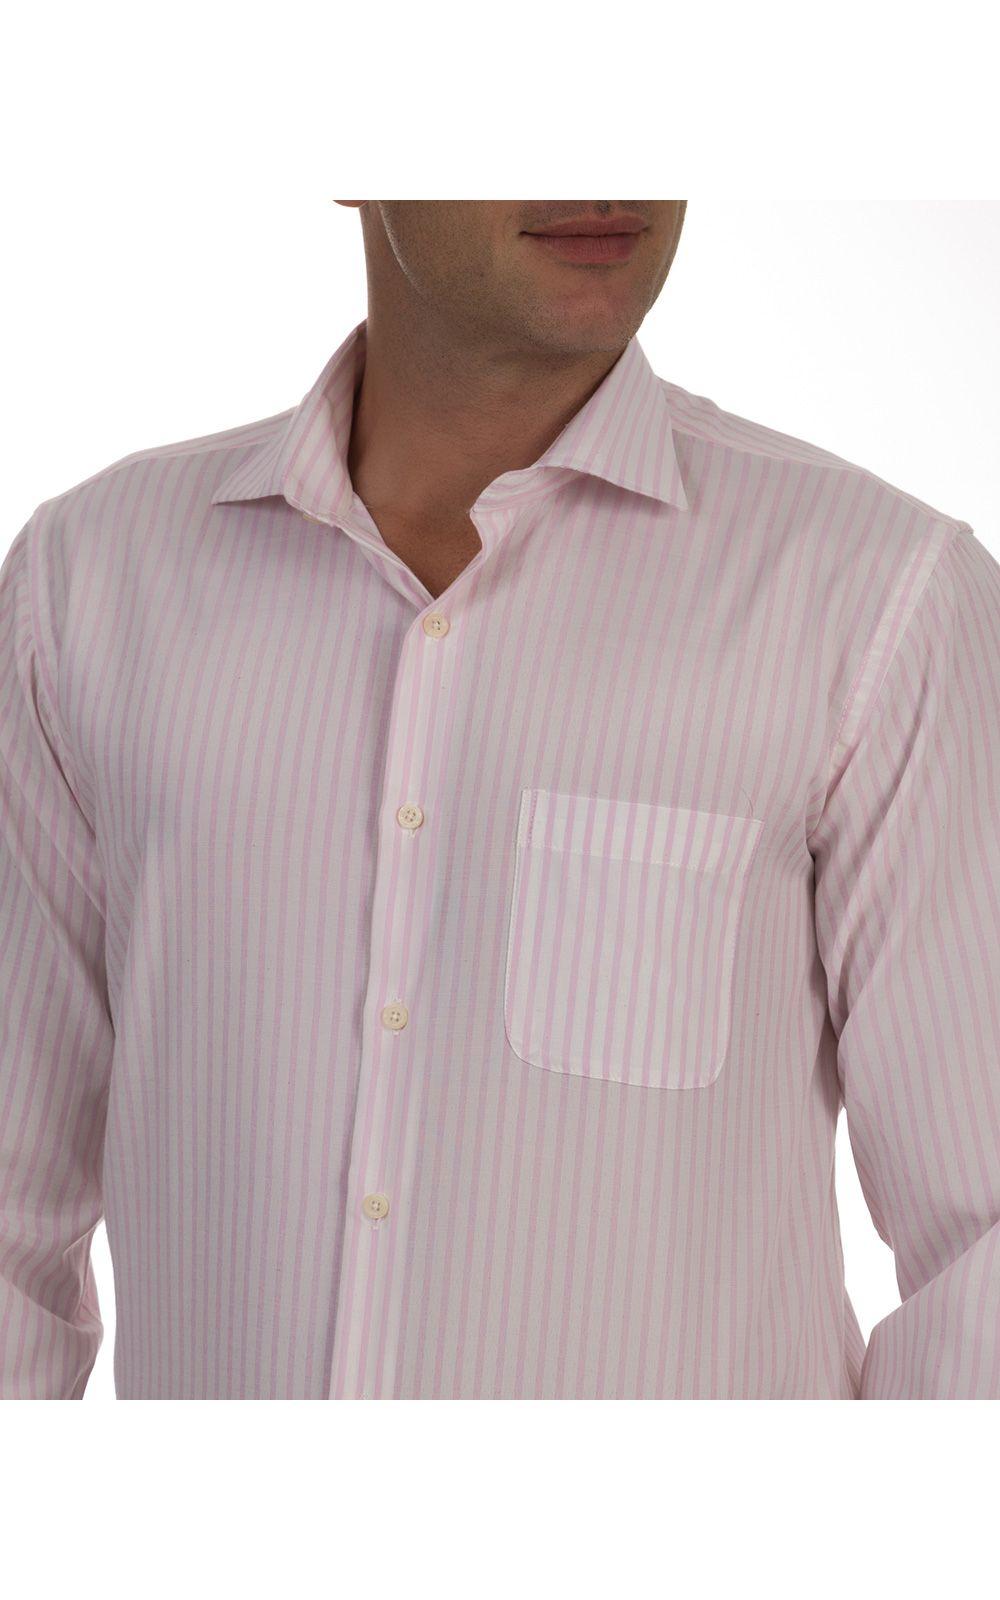 Foto 3 - Camisa Social Masculina Rosa Listrada